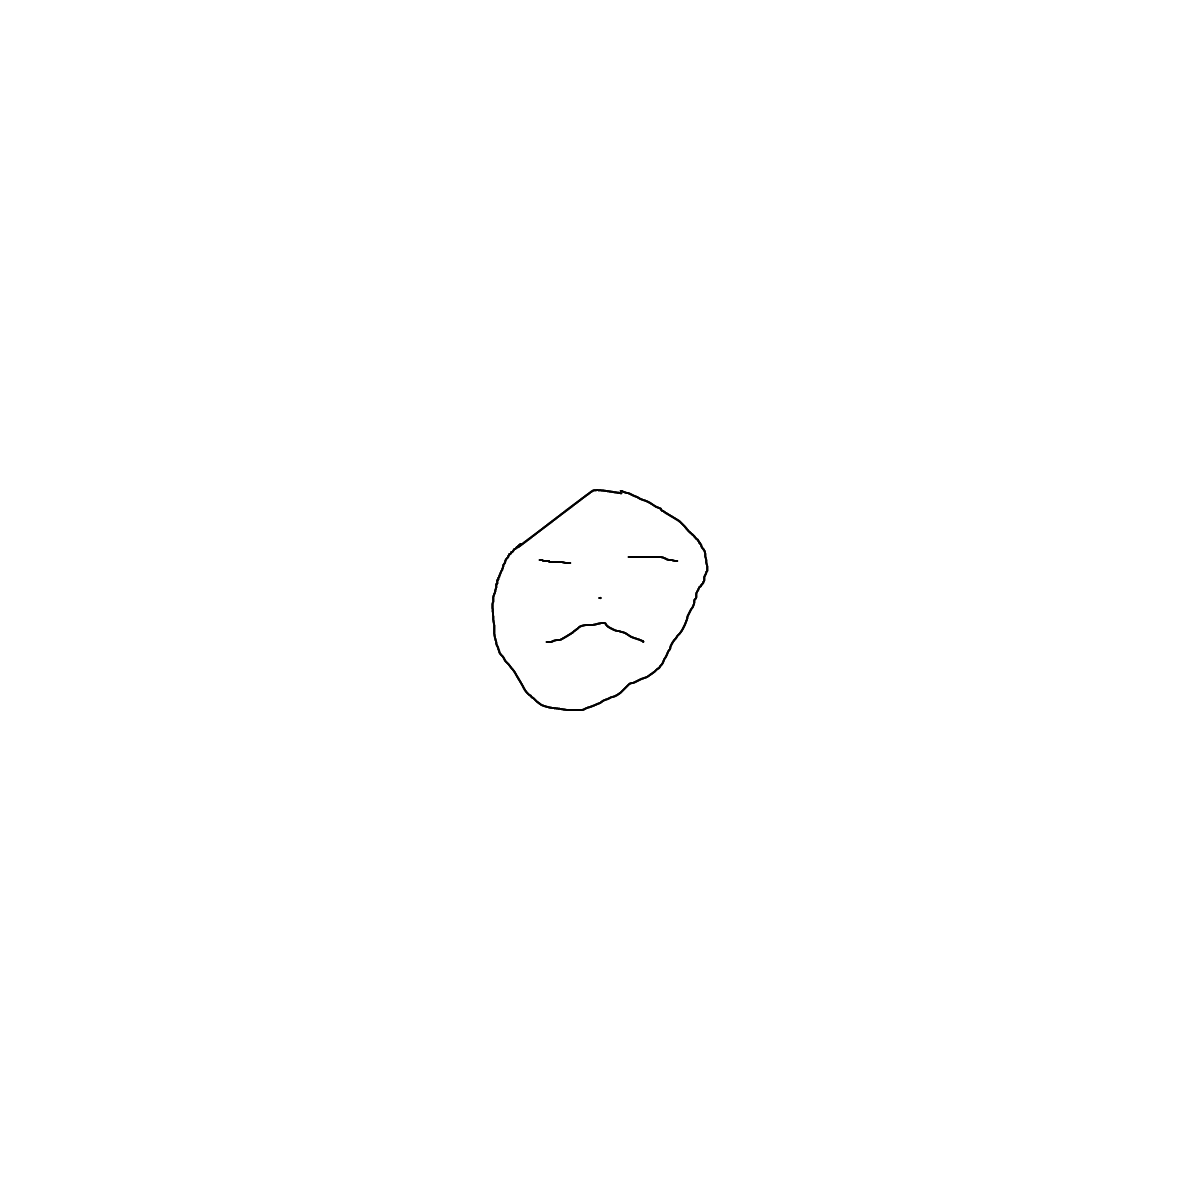 BAAAM drawing#12495 lat:-27.4966716766357420lng: 153.0132293701172000